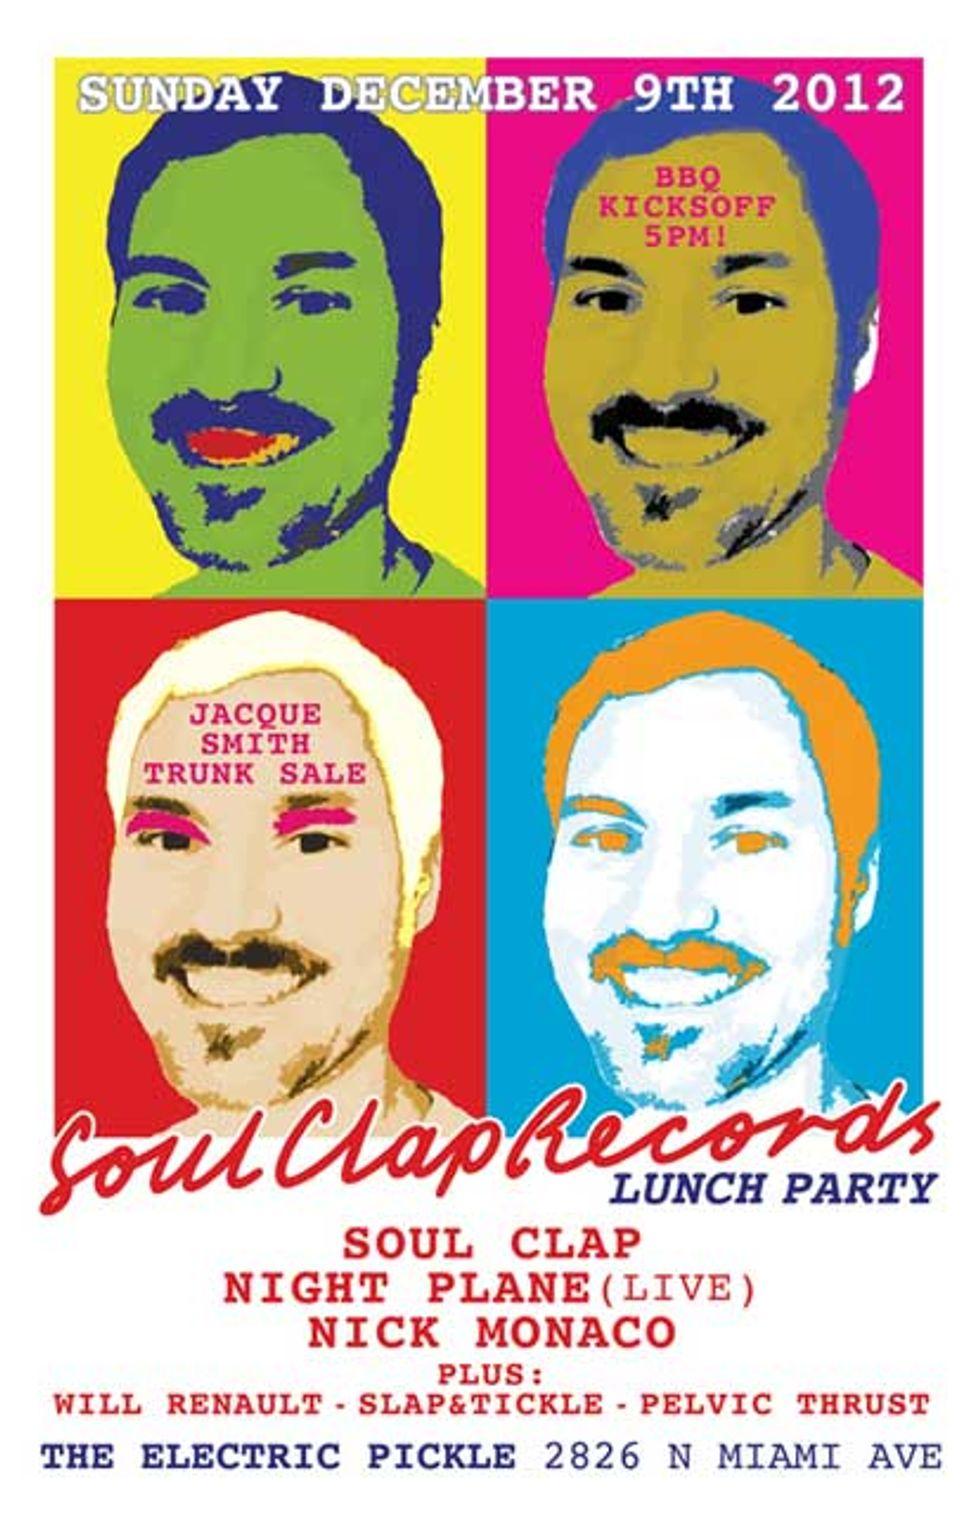 The MEGA Guide to Art Basel Miami Beach 2012: Sunday